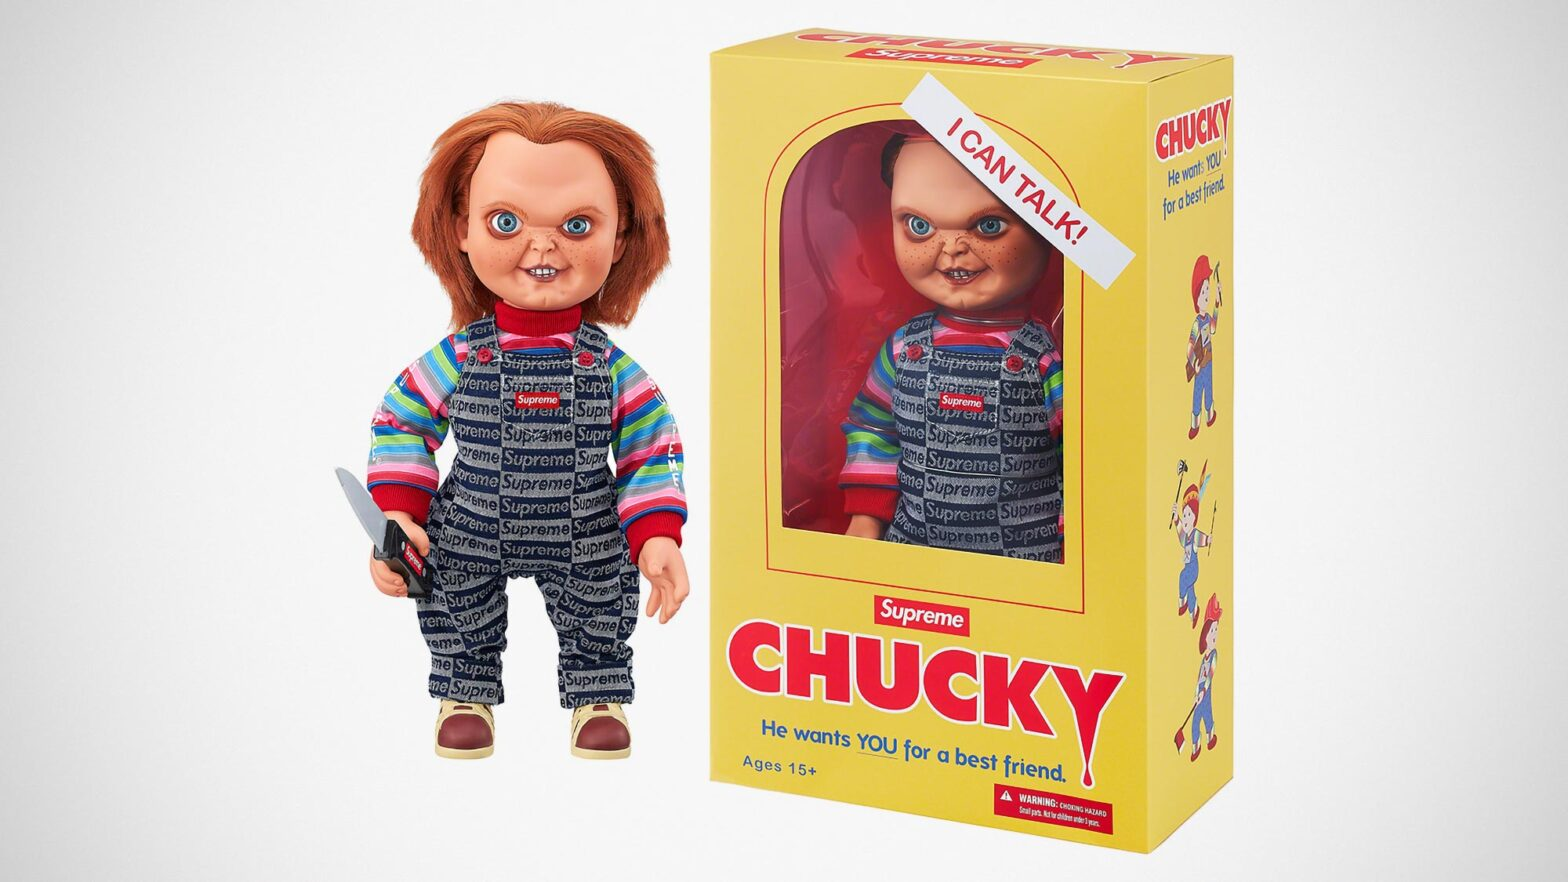 Supreme Chucky Doll